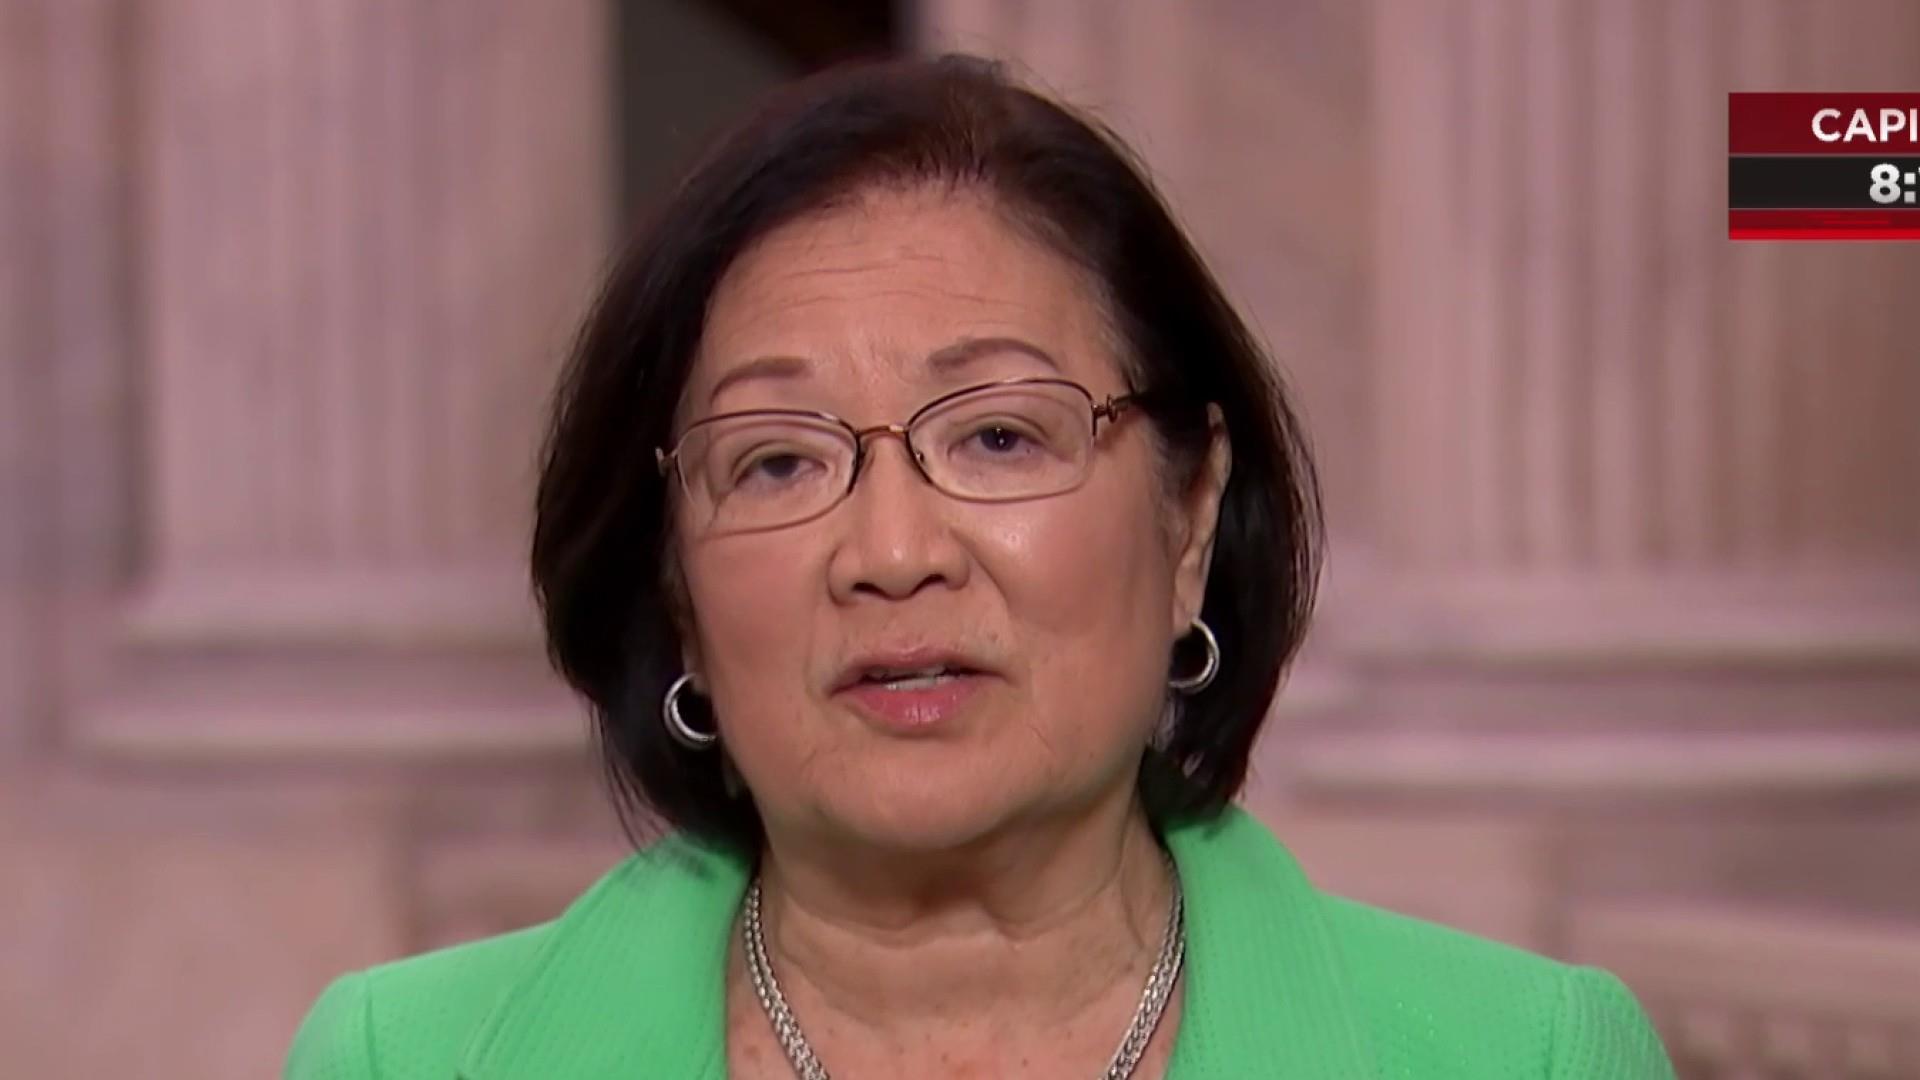 Sen. Hirono on the chaos in Washington